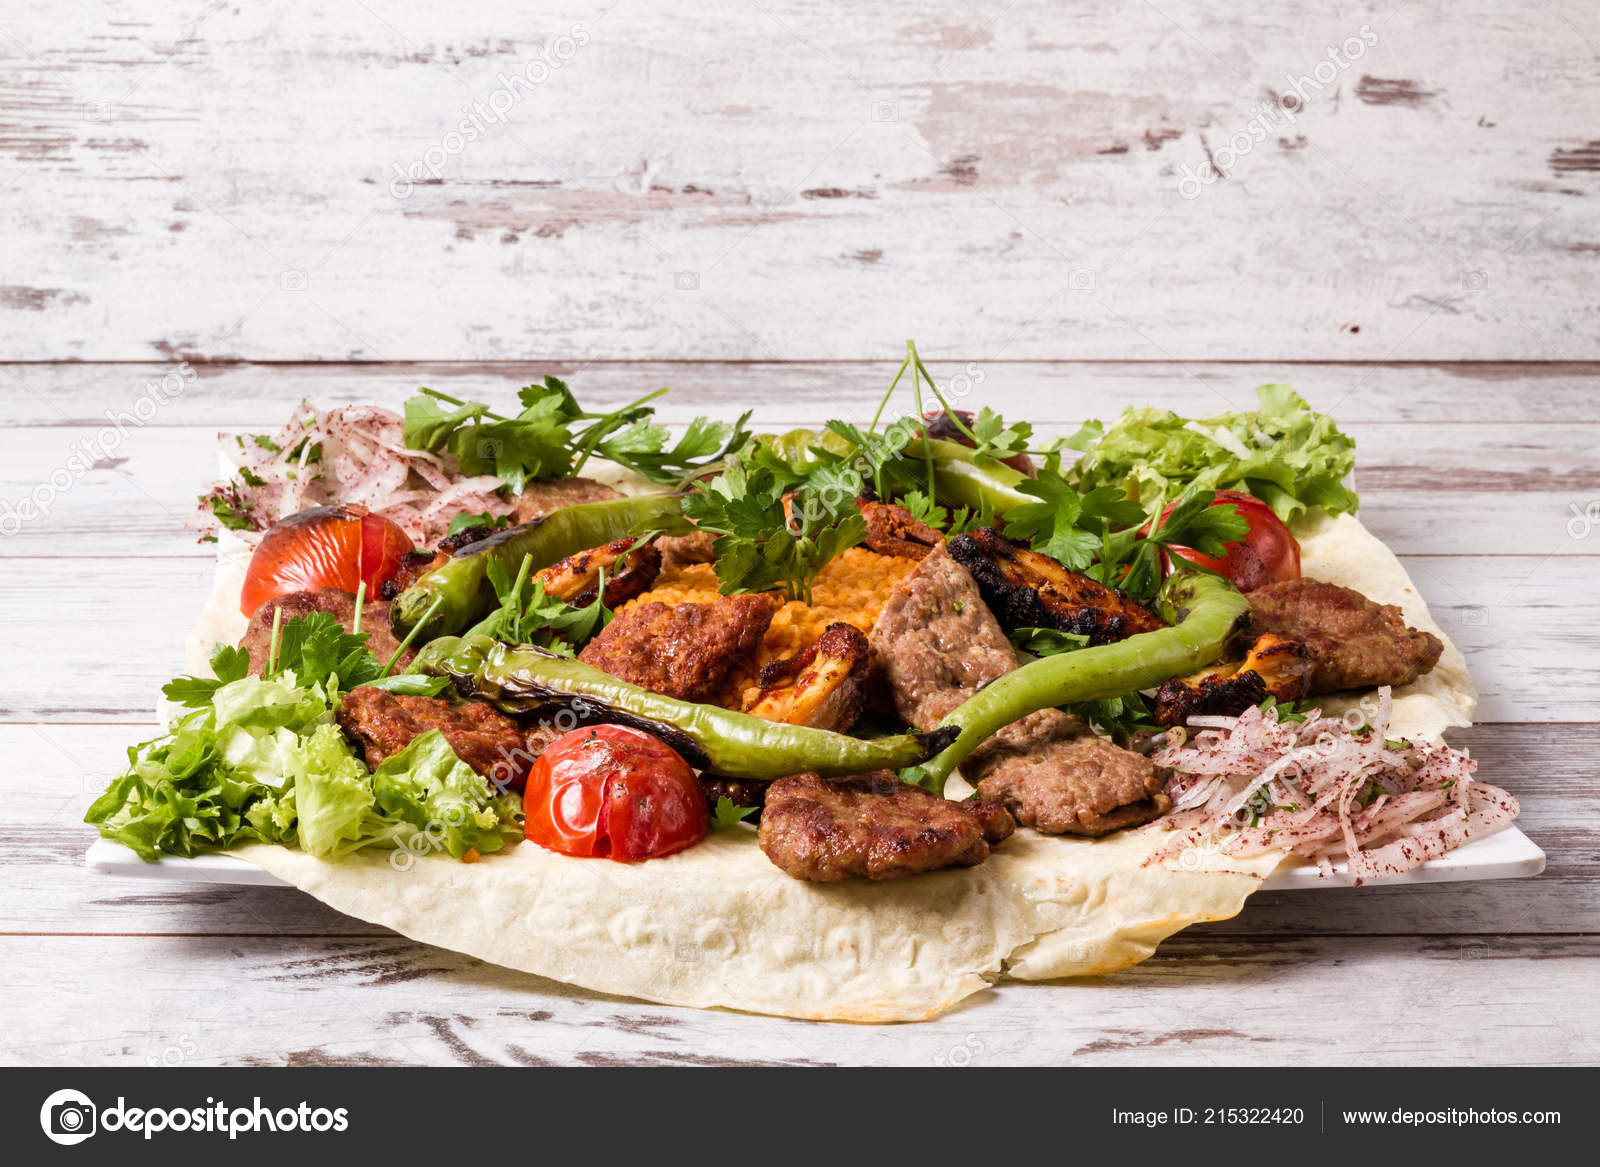 Turkish Traditional Mixed Kebab Plate Adana Chicken Kebabs Stock Photo Image By C Hskoken 215322420